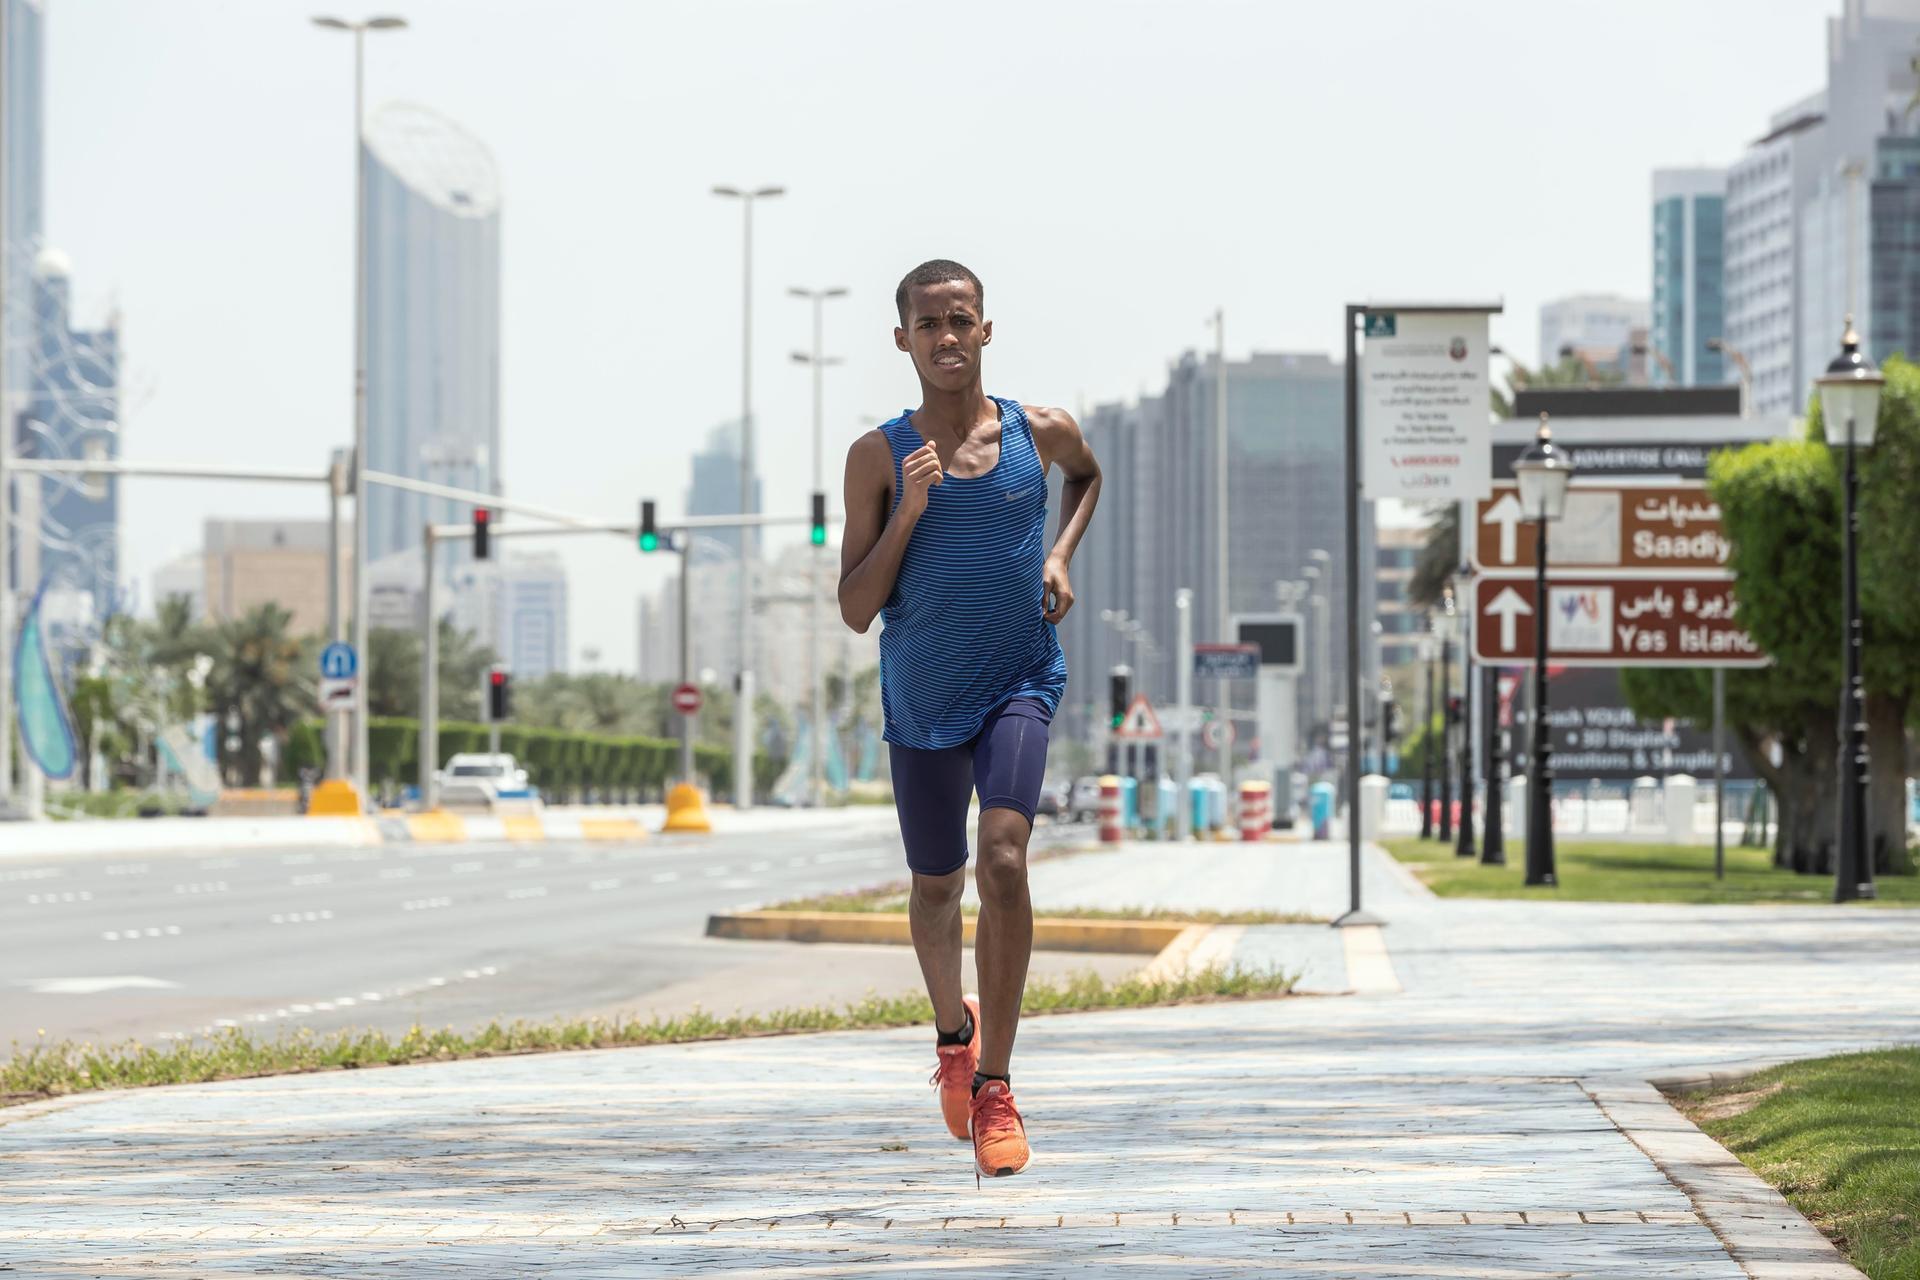 Abdulsalam Farah runs in Abu Dhabi.